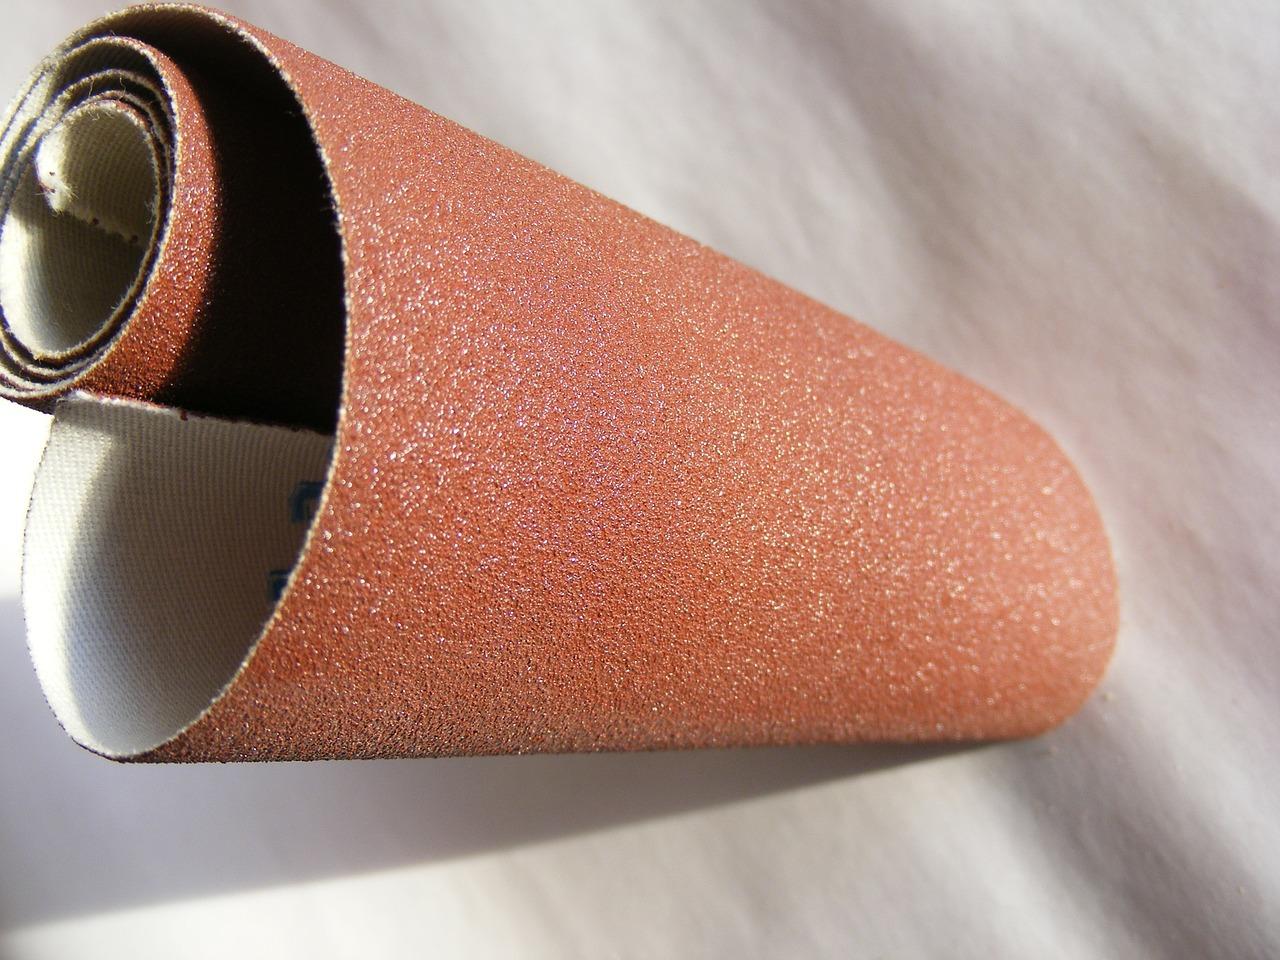 A roll of sandpaper